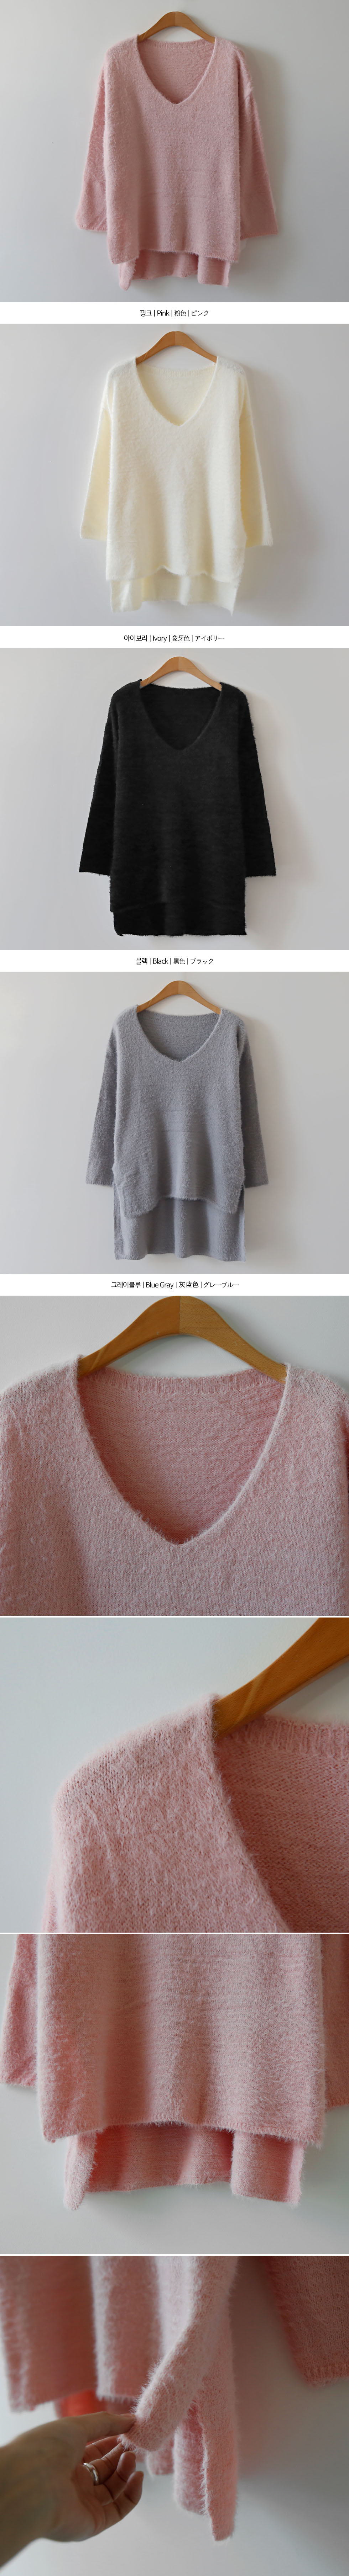 Glam Unleavened Knit